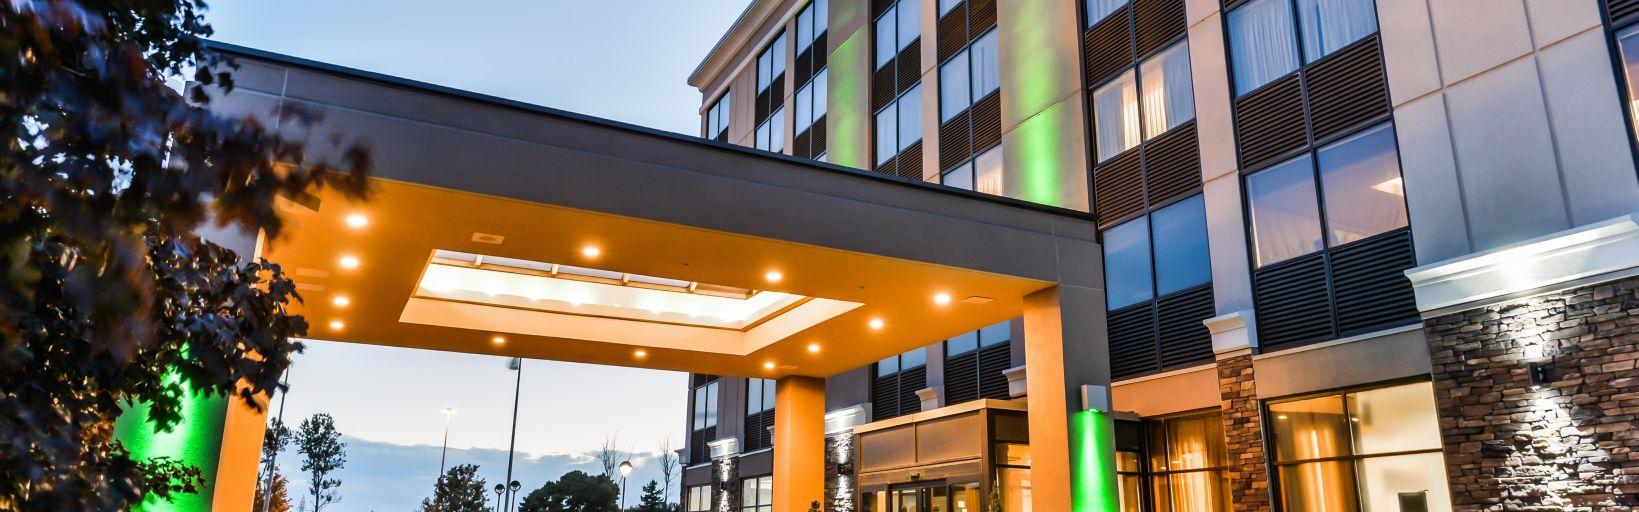 Holiday Inn Kitchener-Waterloo Conf. Ctr. Hotel by IHG